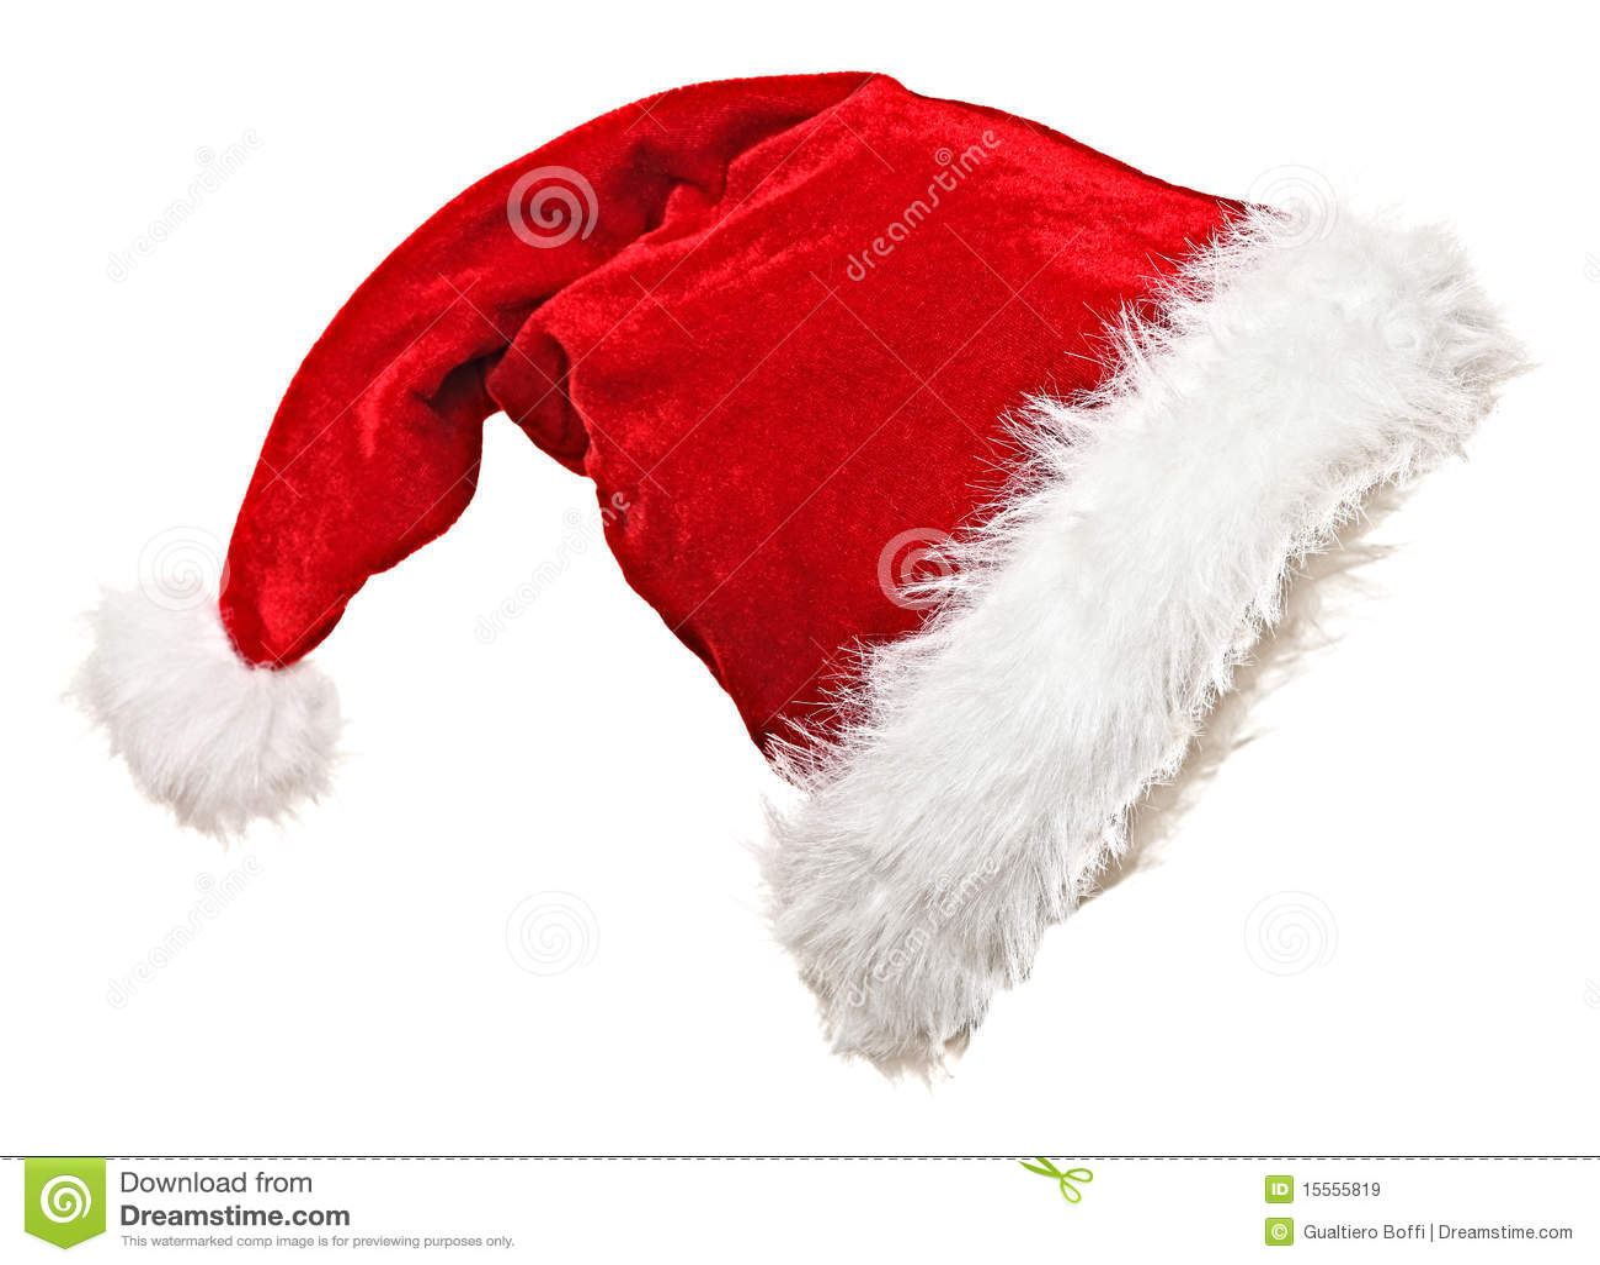 8e3a6d2cf60 Santa claus hat stock image. Image of christmas